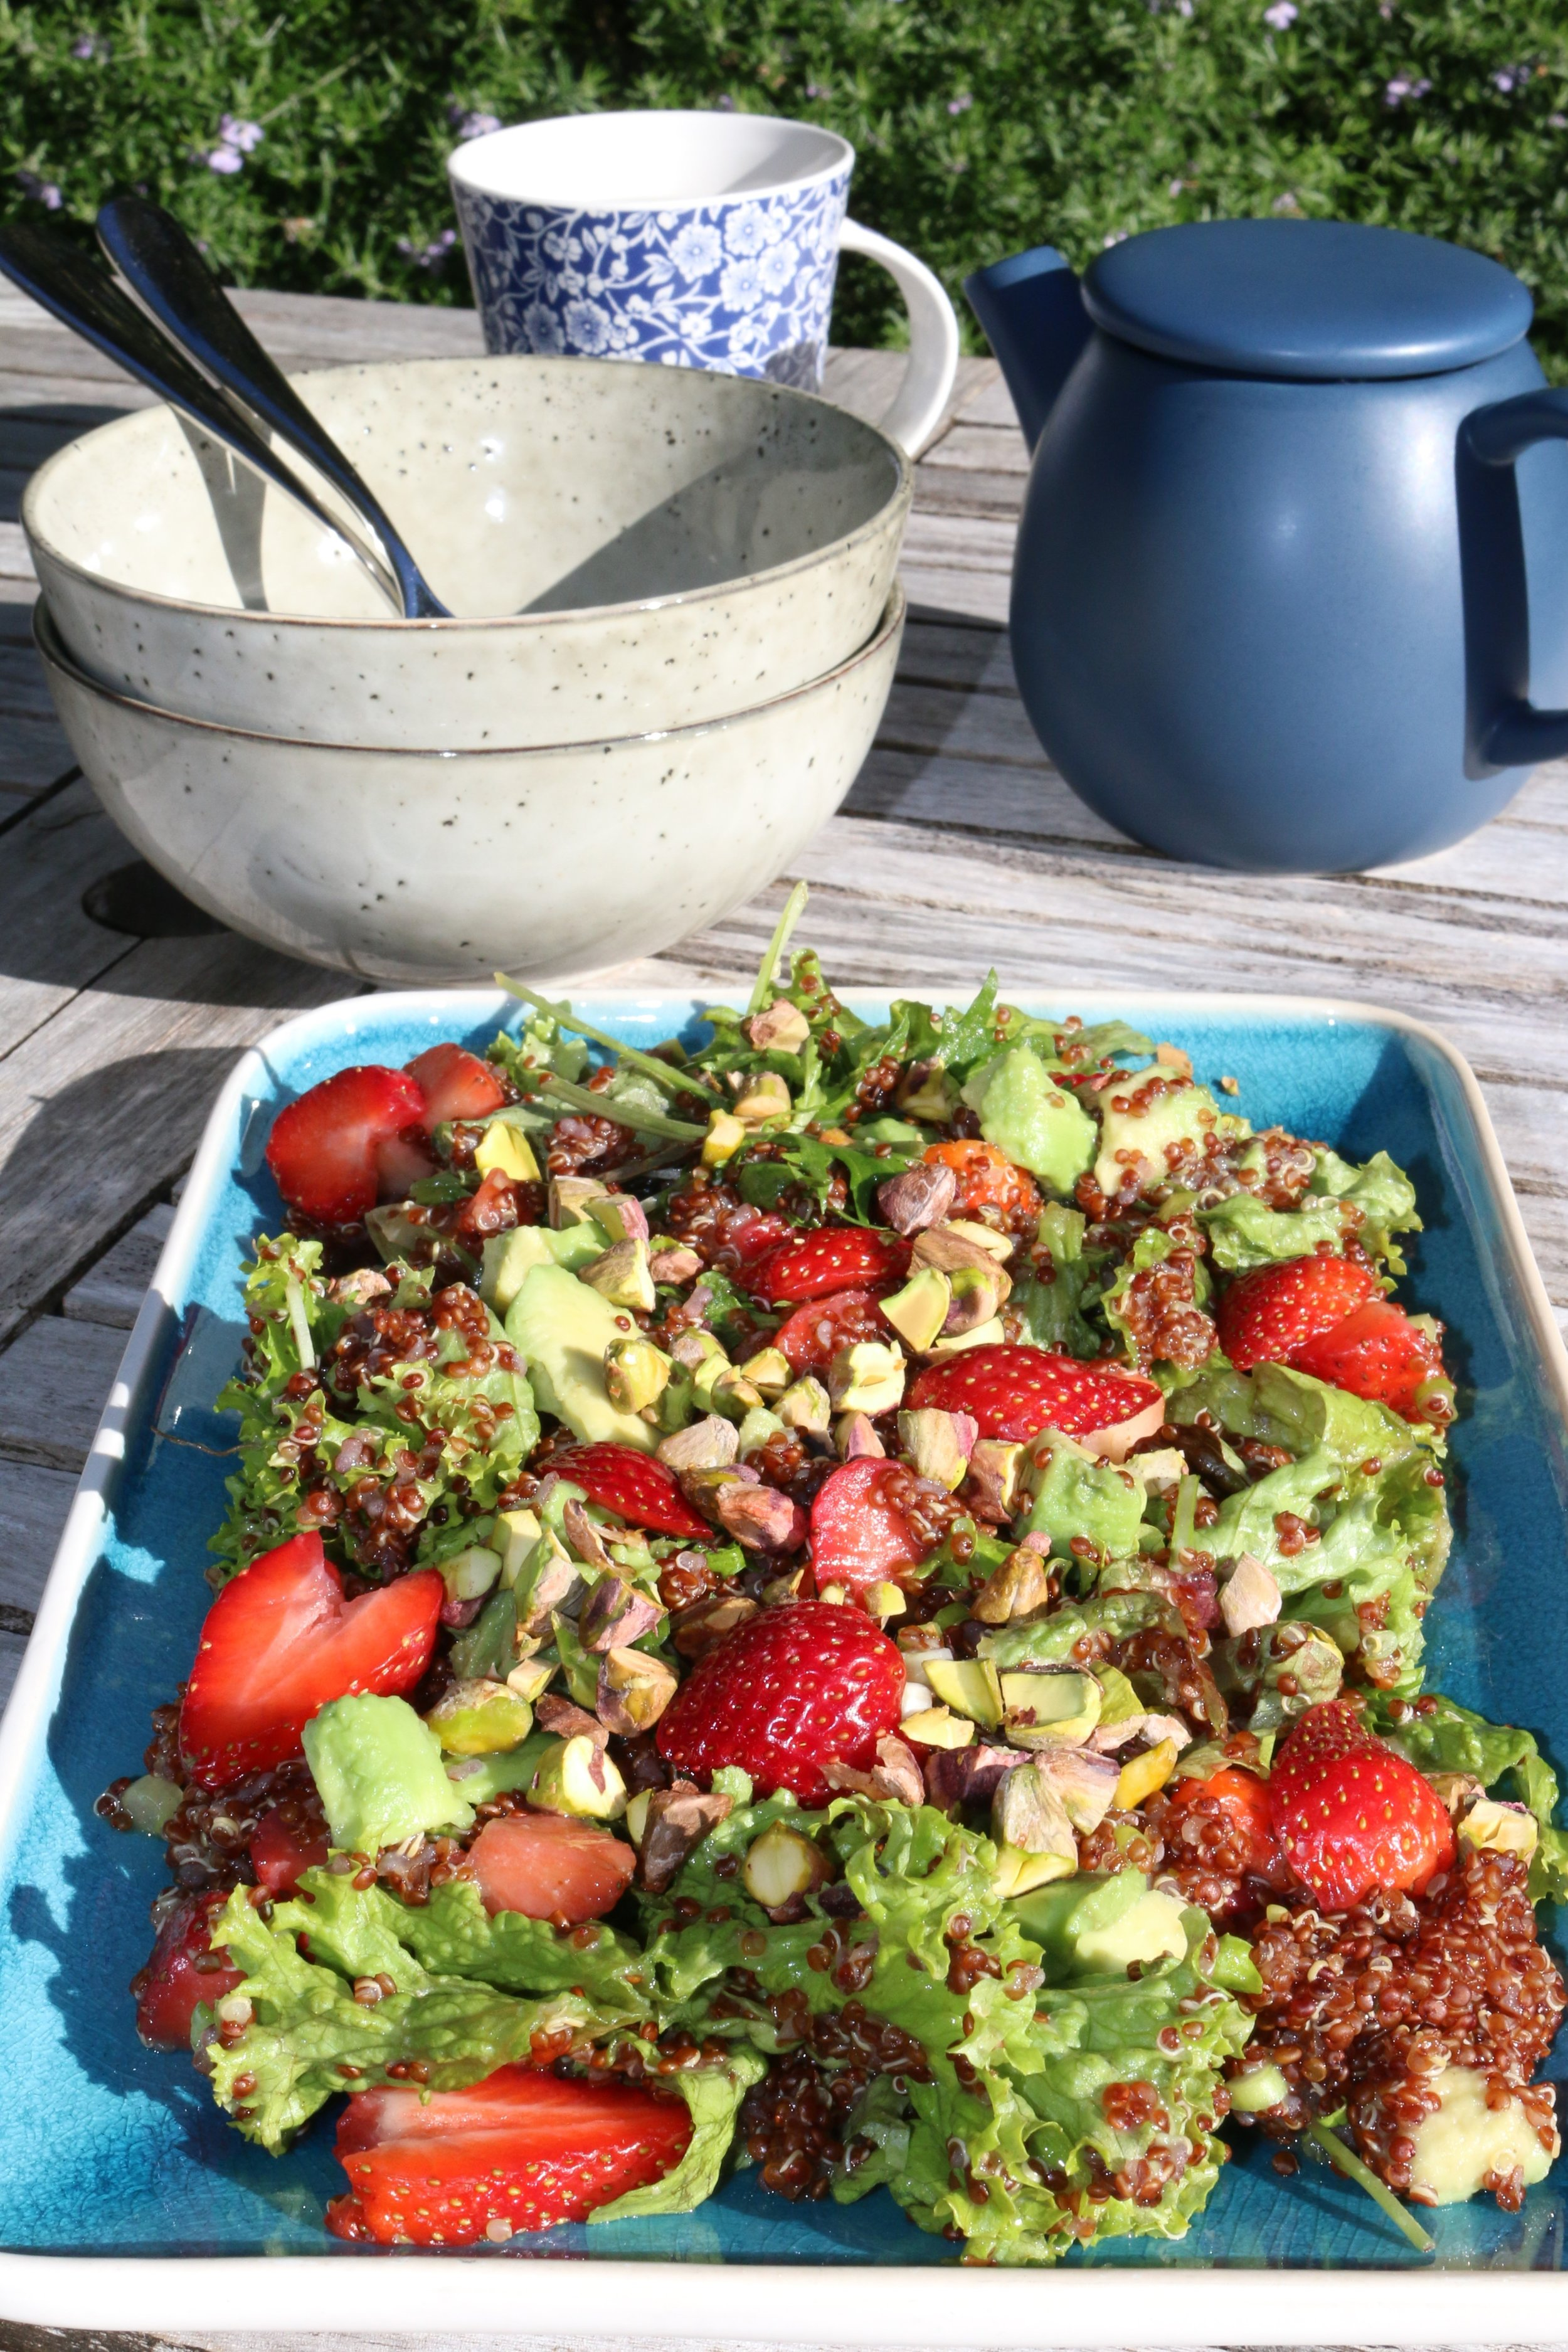 Strawberry, Pistachio and Quinoa Salad  Contribution from Rachel Knight